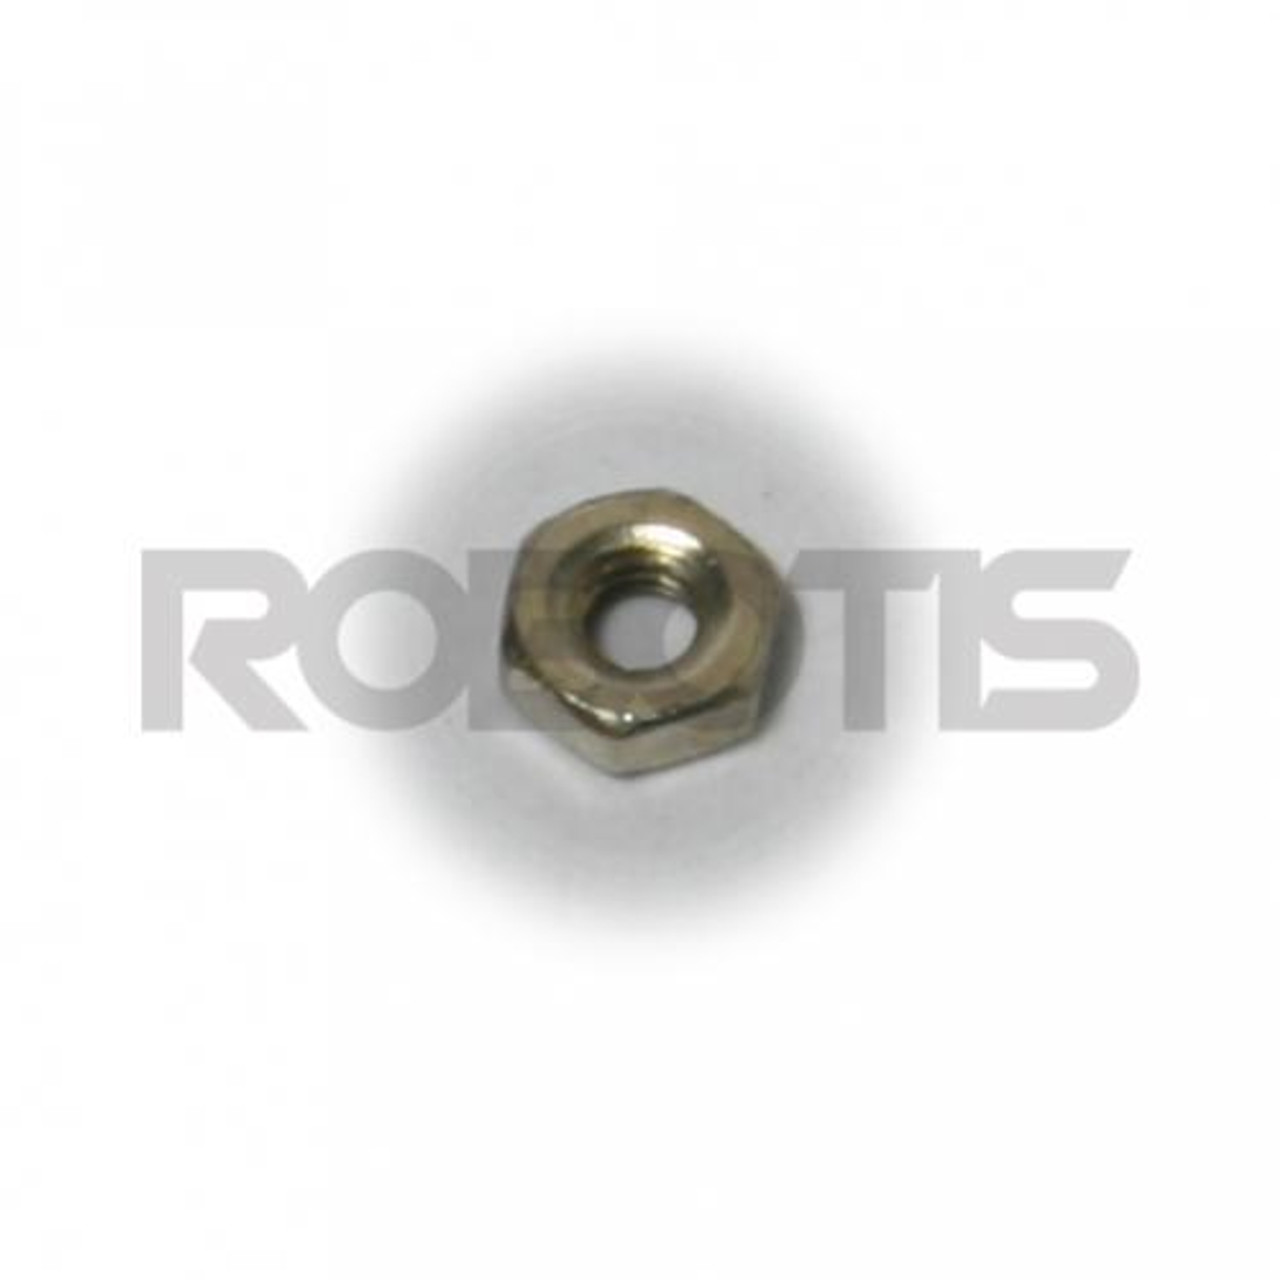 N1 Nut M2 (400 pcs)